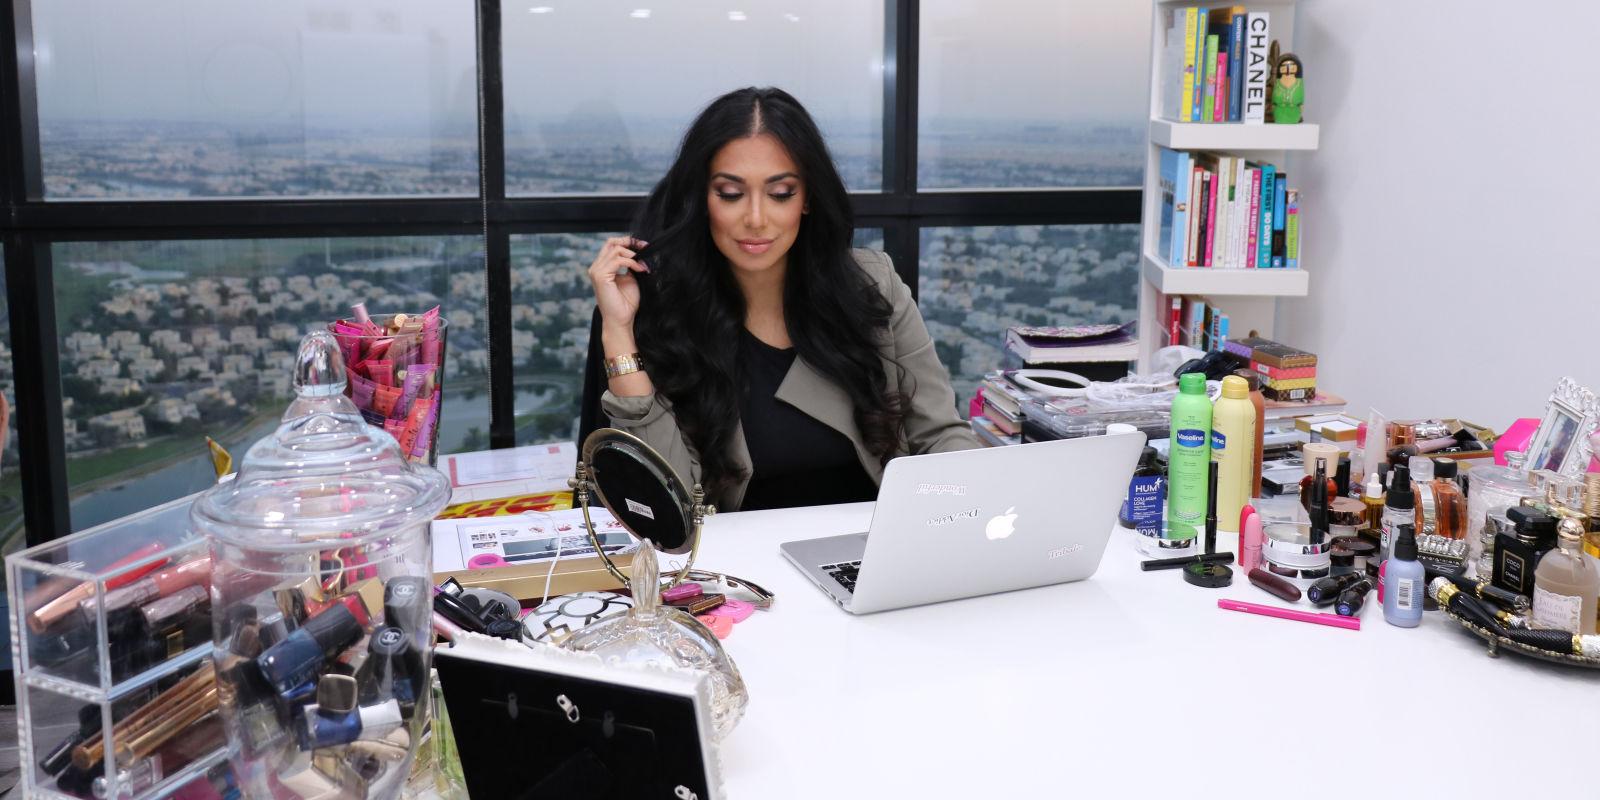 Huda Kattan Makeup And Beauty Tips 10 Beauty Tricks From